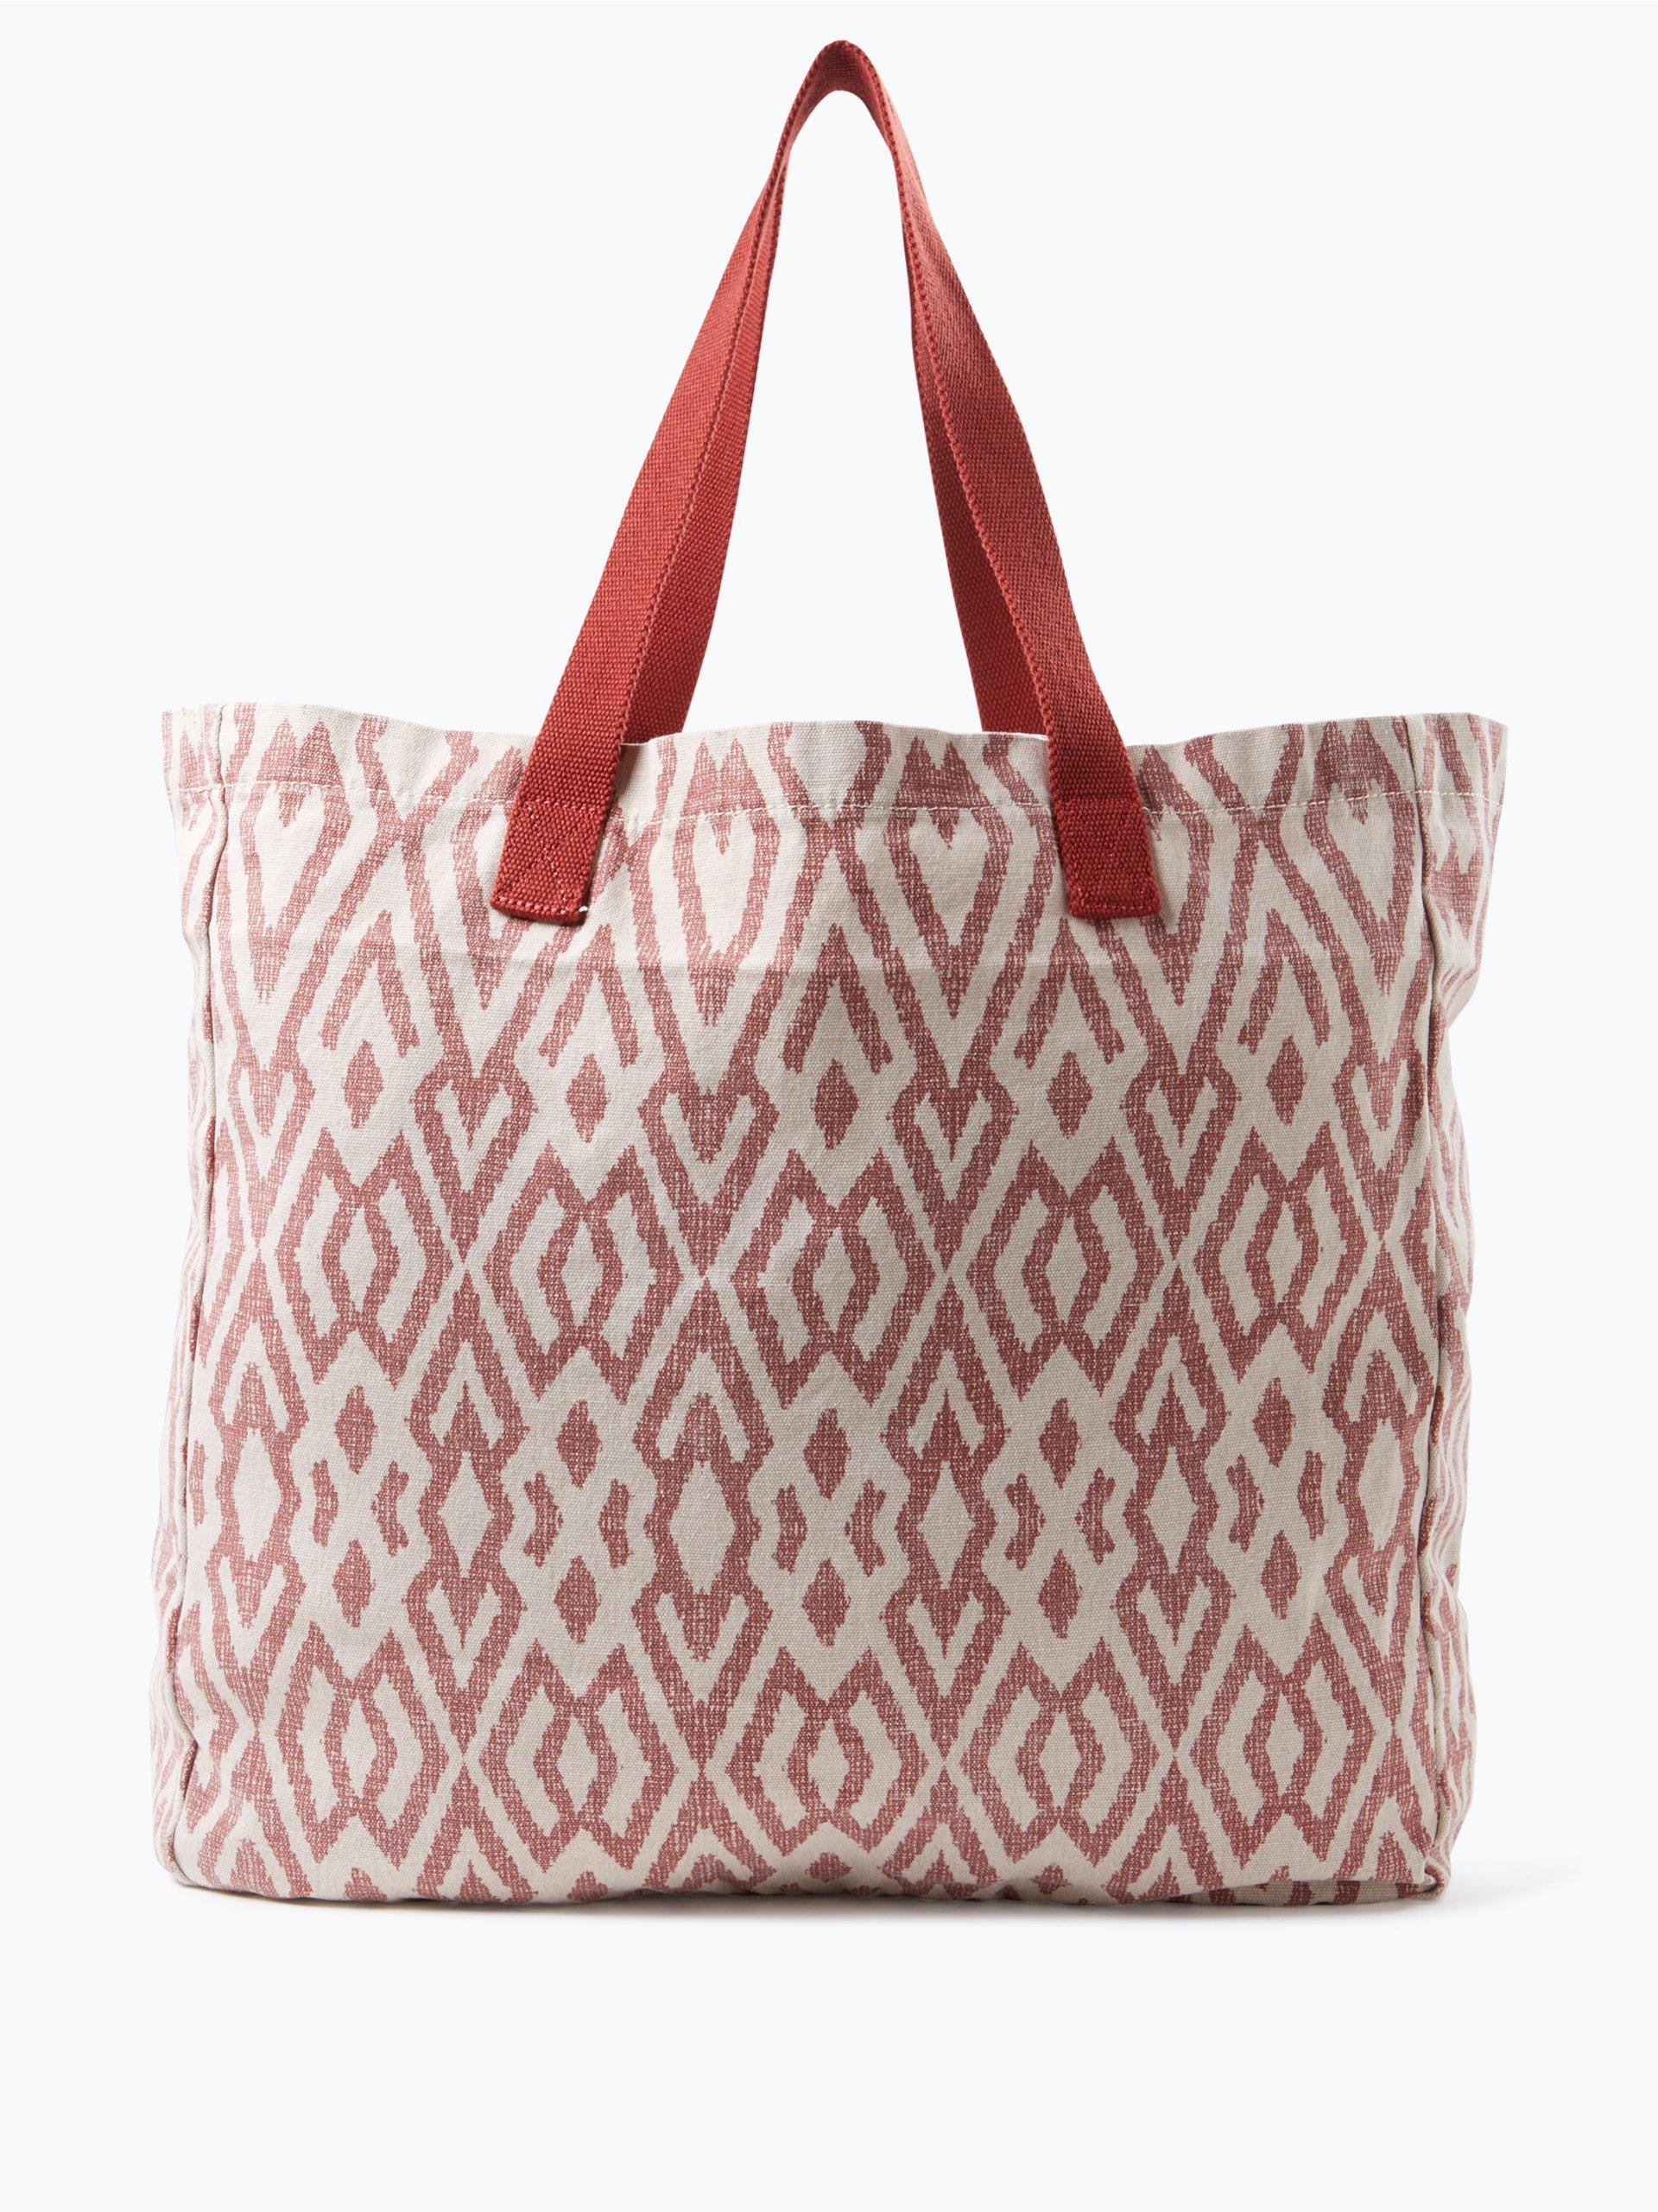 Esprit Casual Damen Shopper